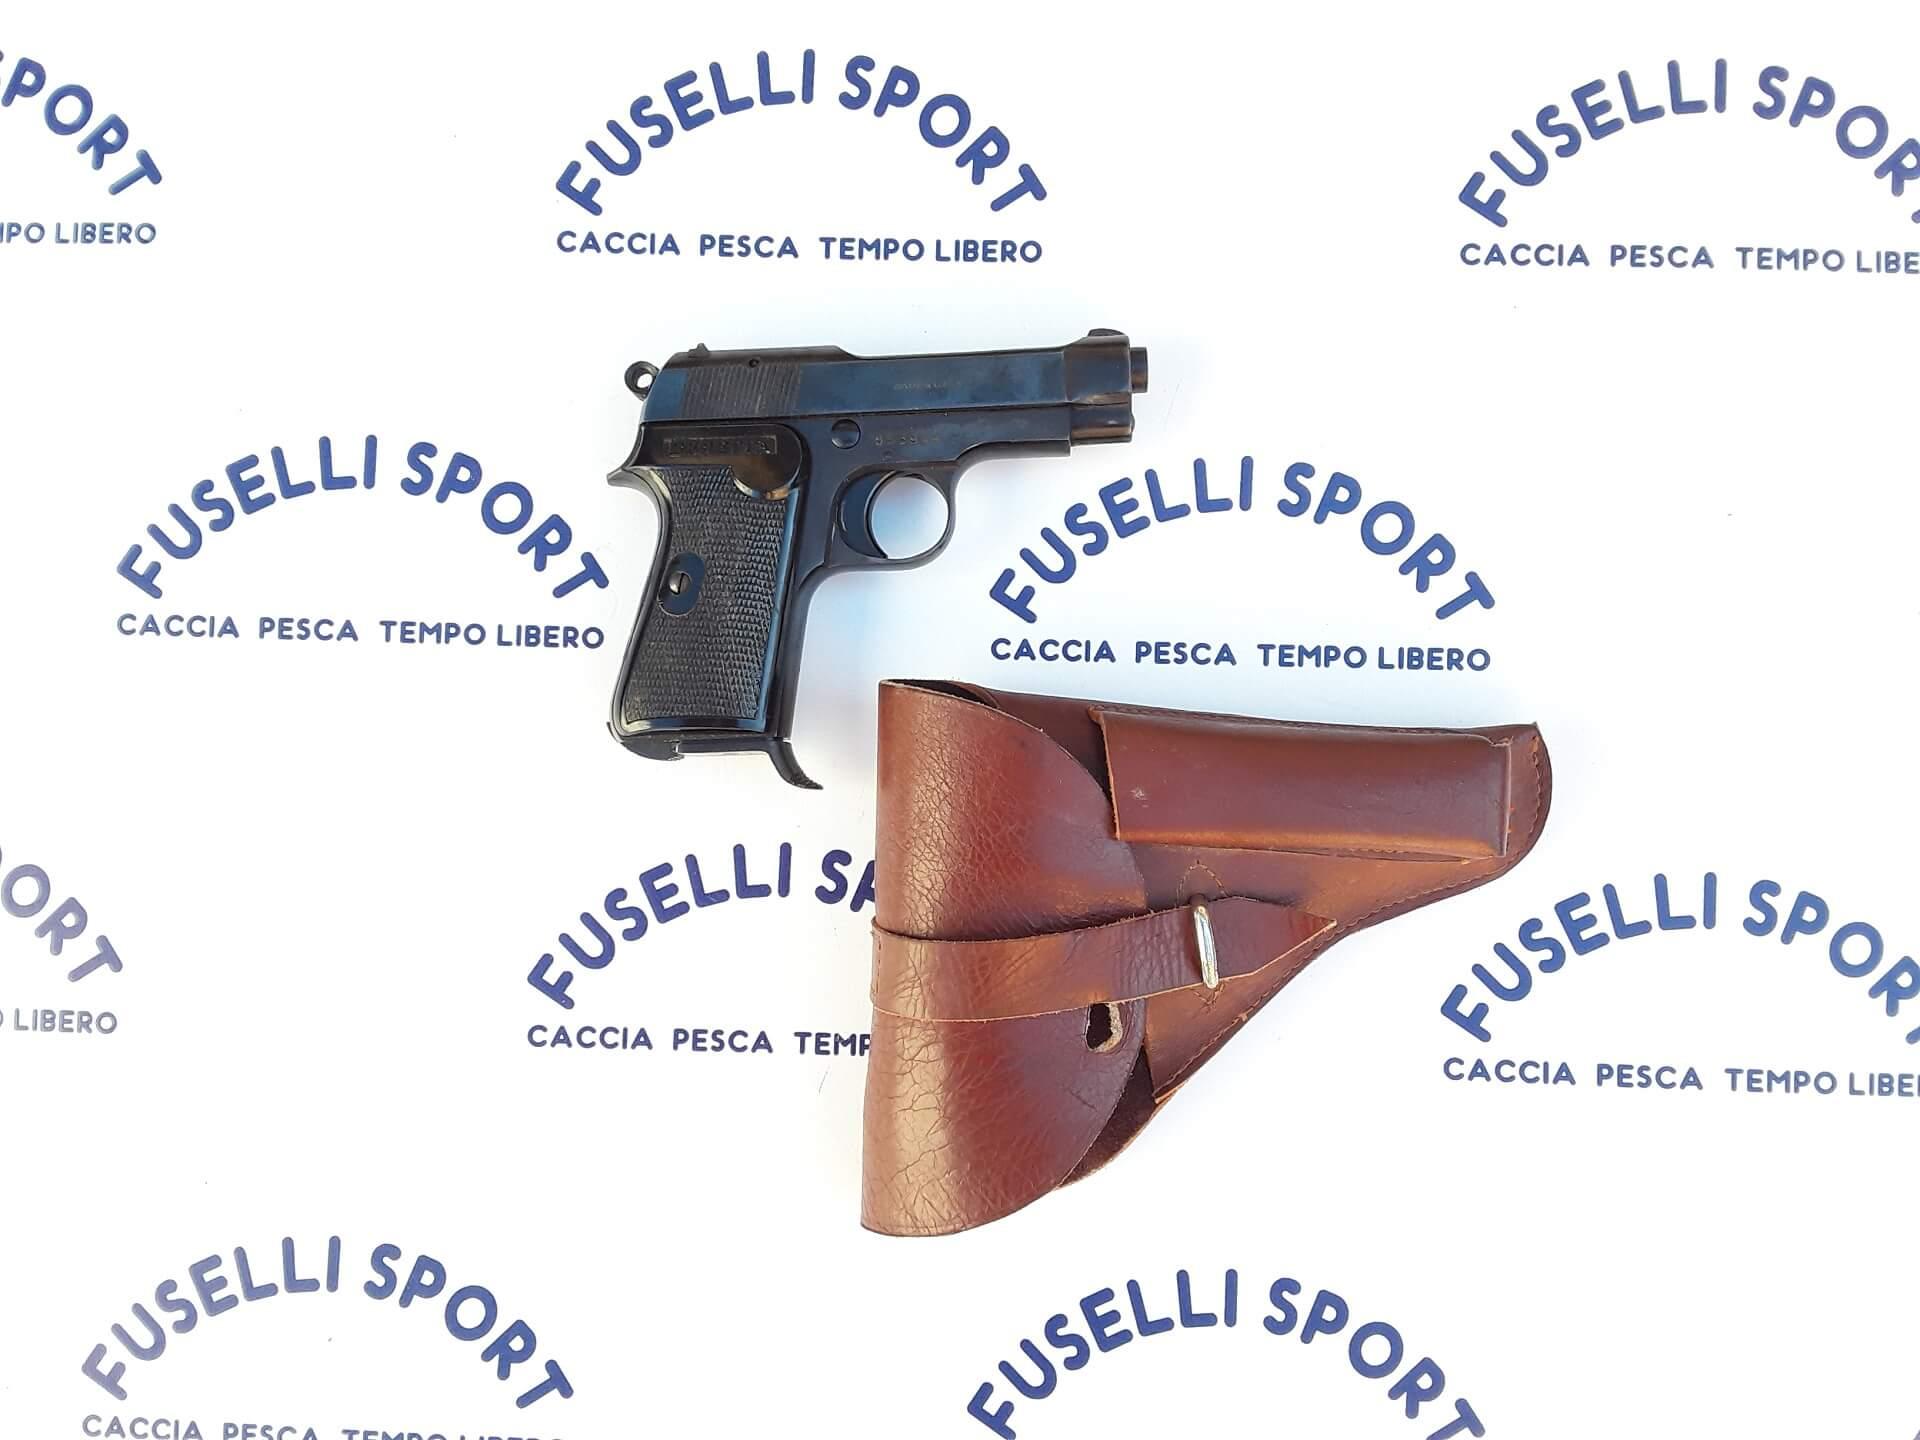 pistola Beretta modello 35